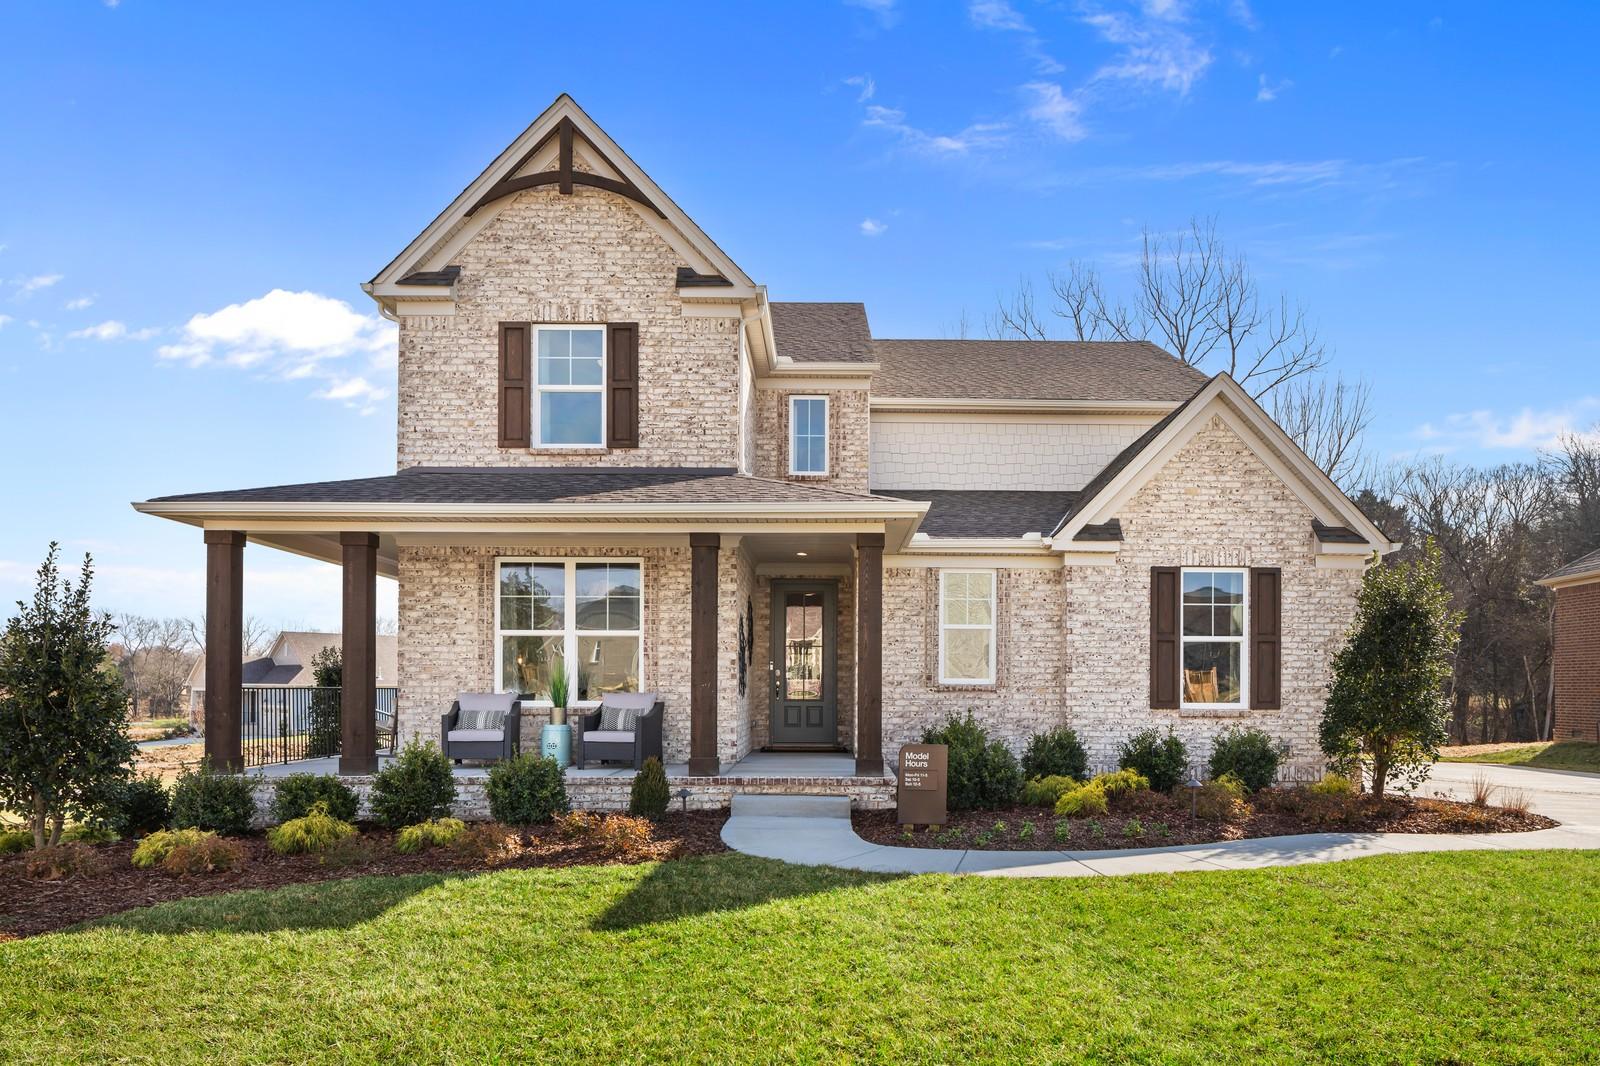 1095 River Oaks Blvd Property Photo - Lebanon, TN real estate listing